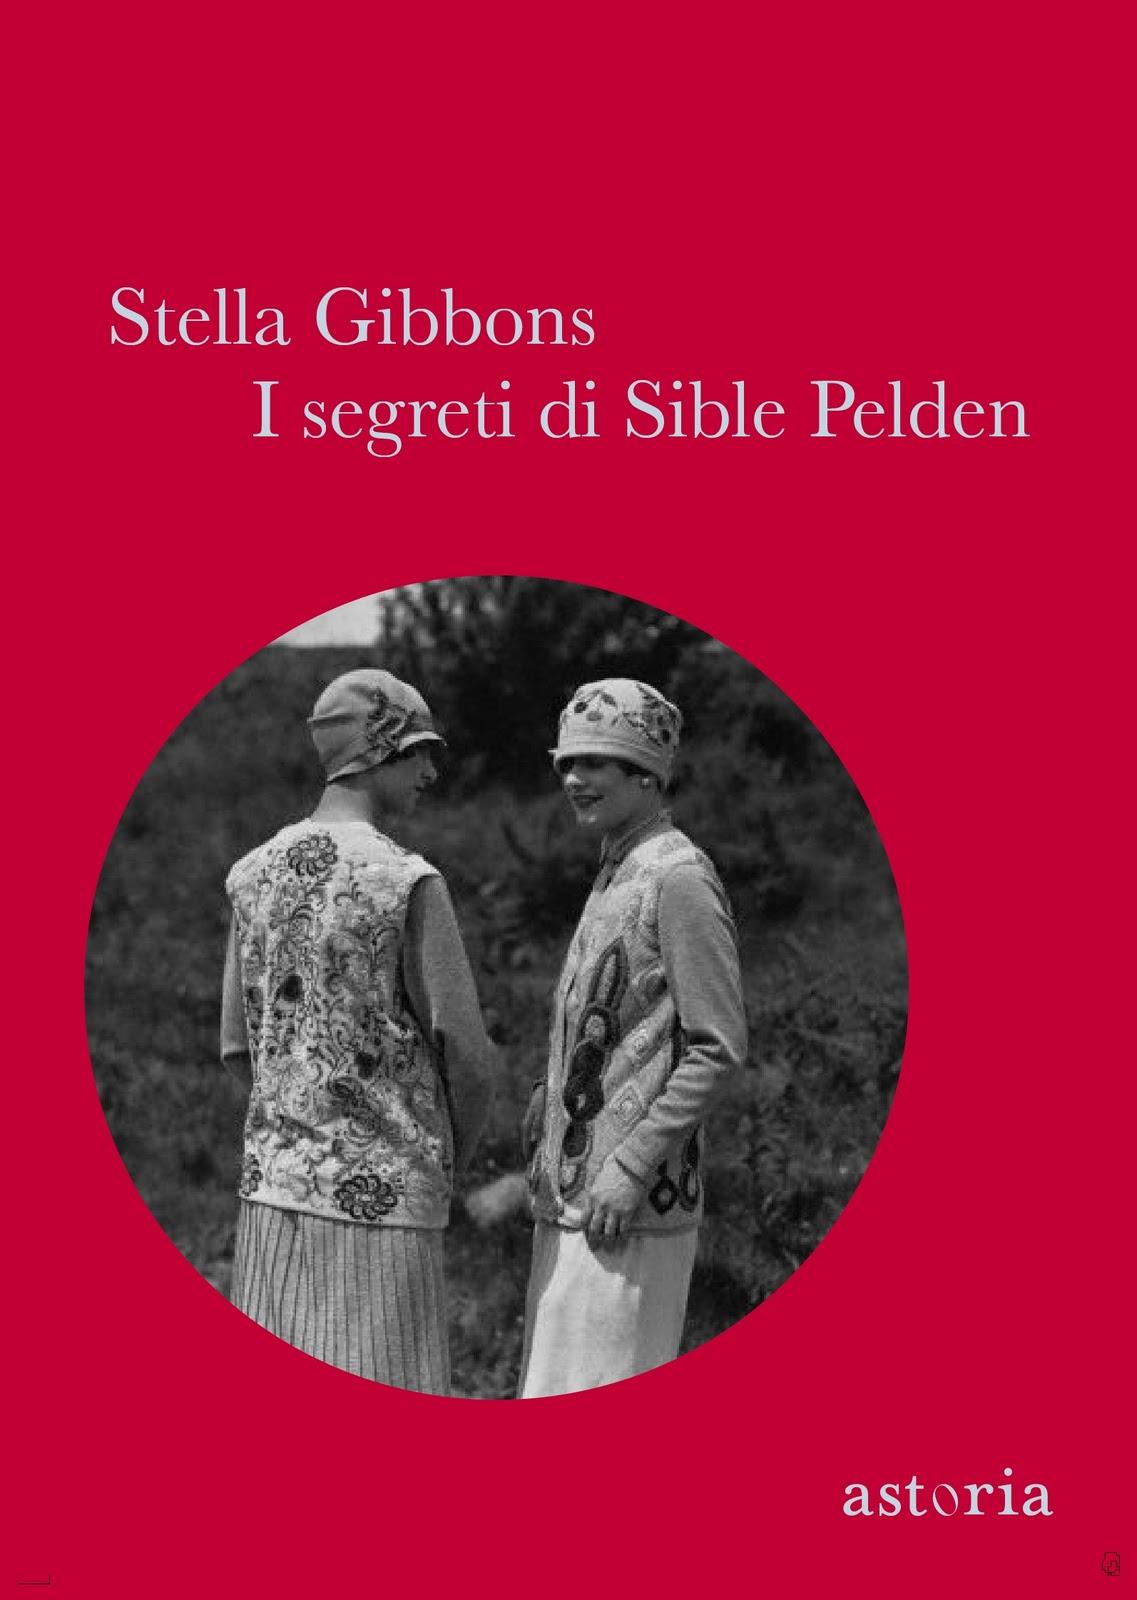 I segreti di Sible Pelden